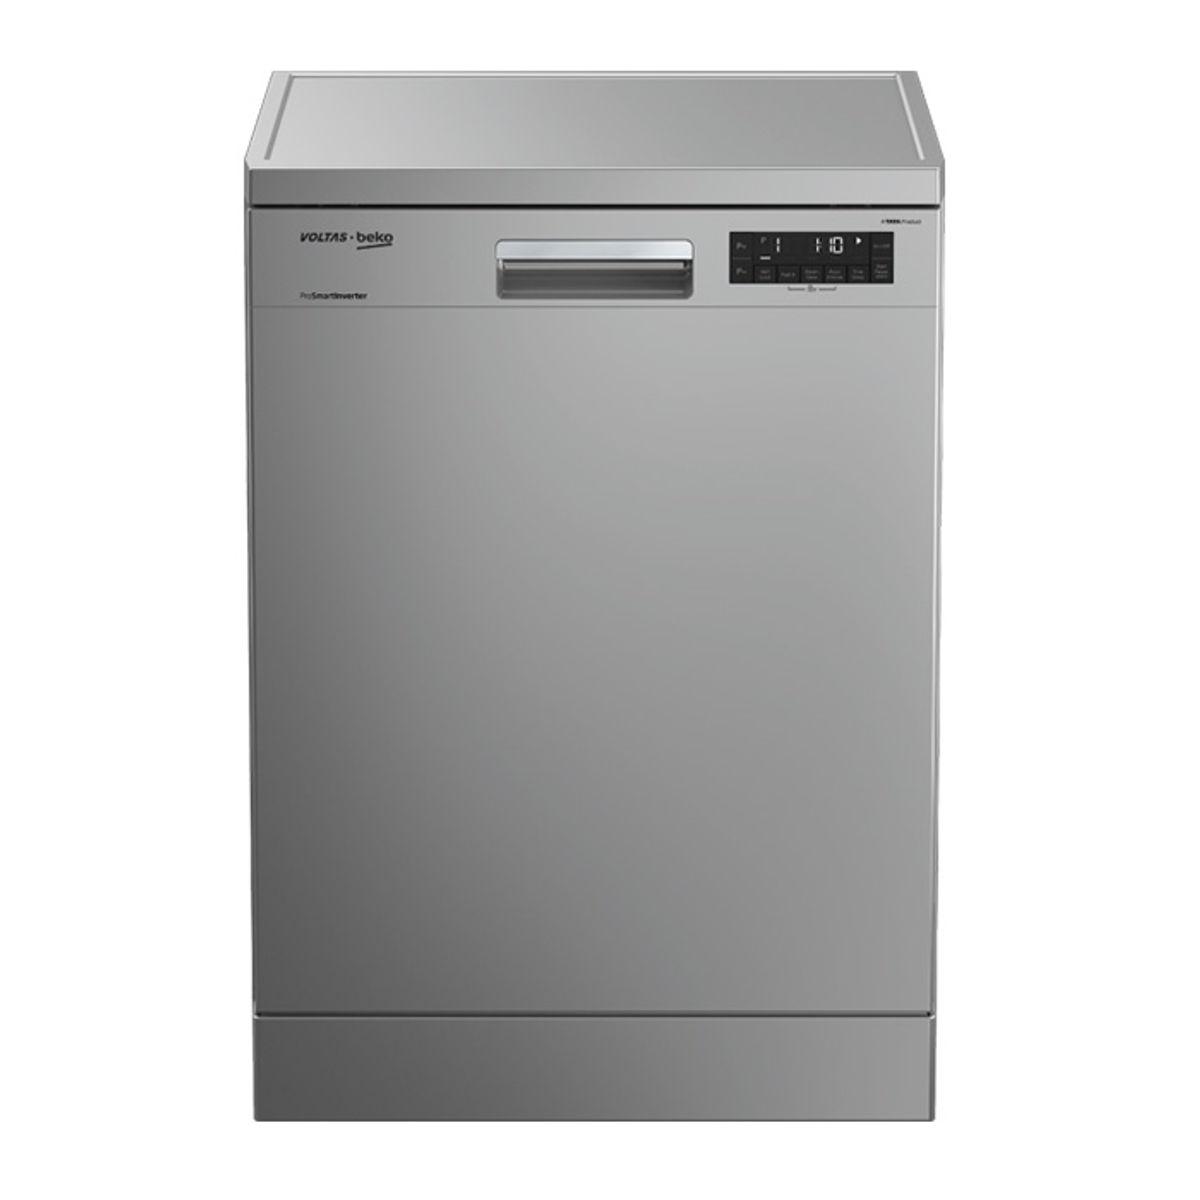 वोल्टास DF14S Dishwasher